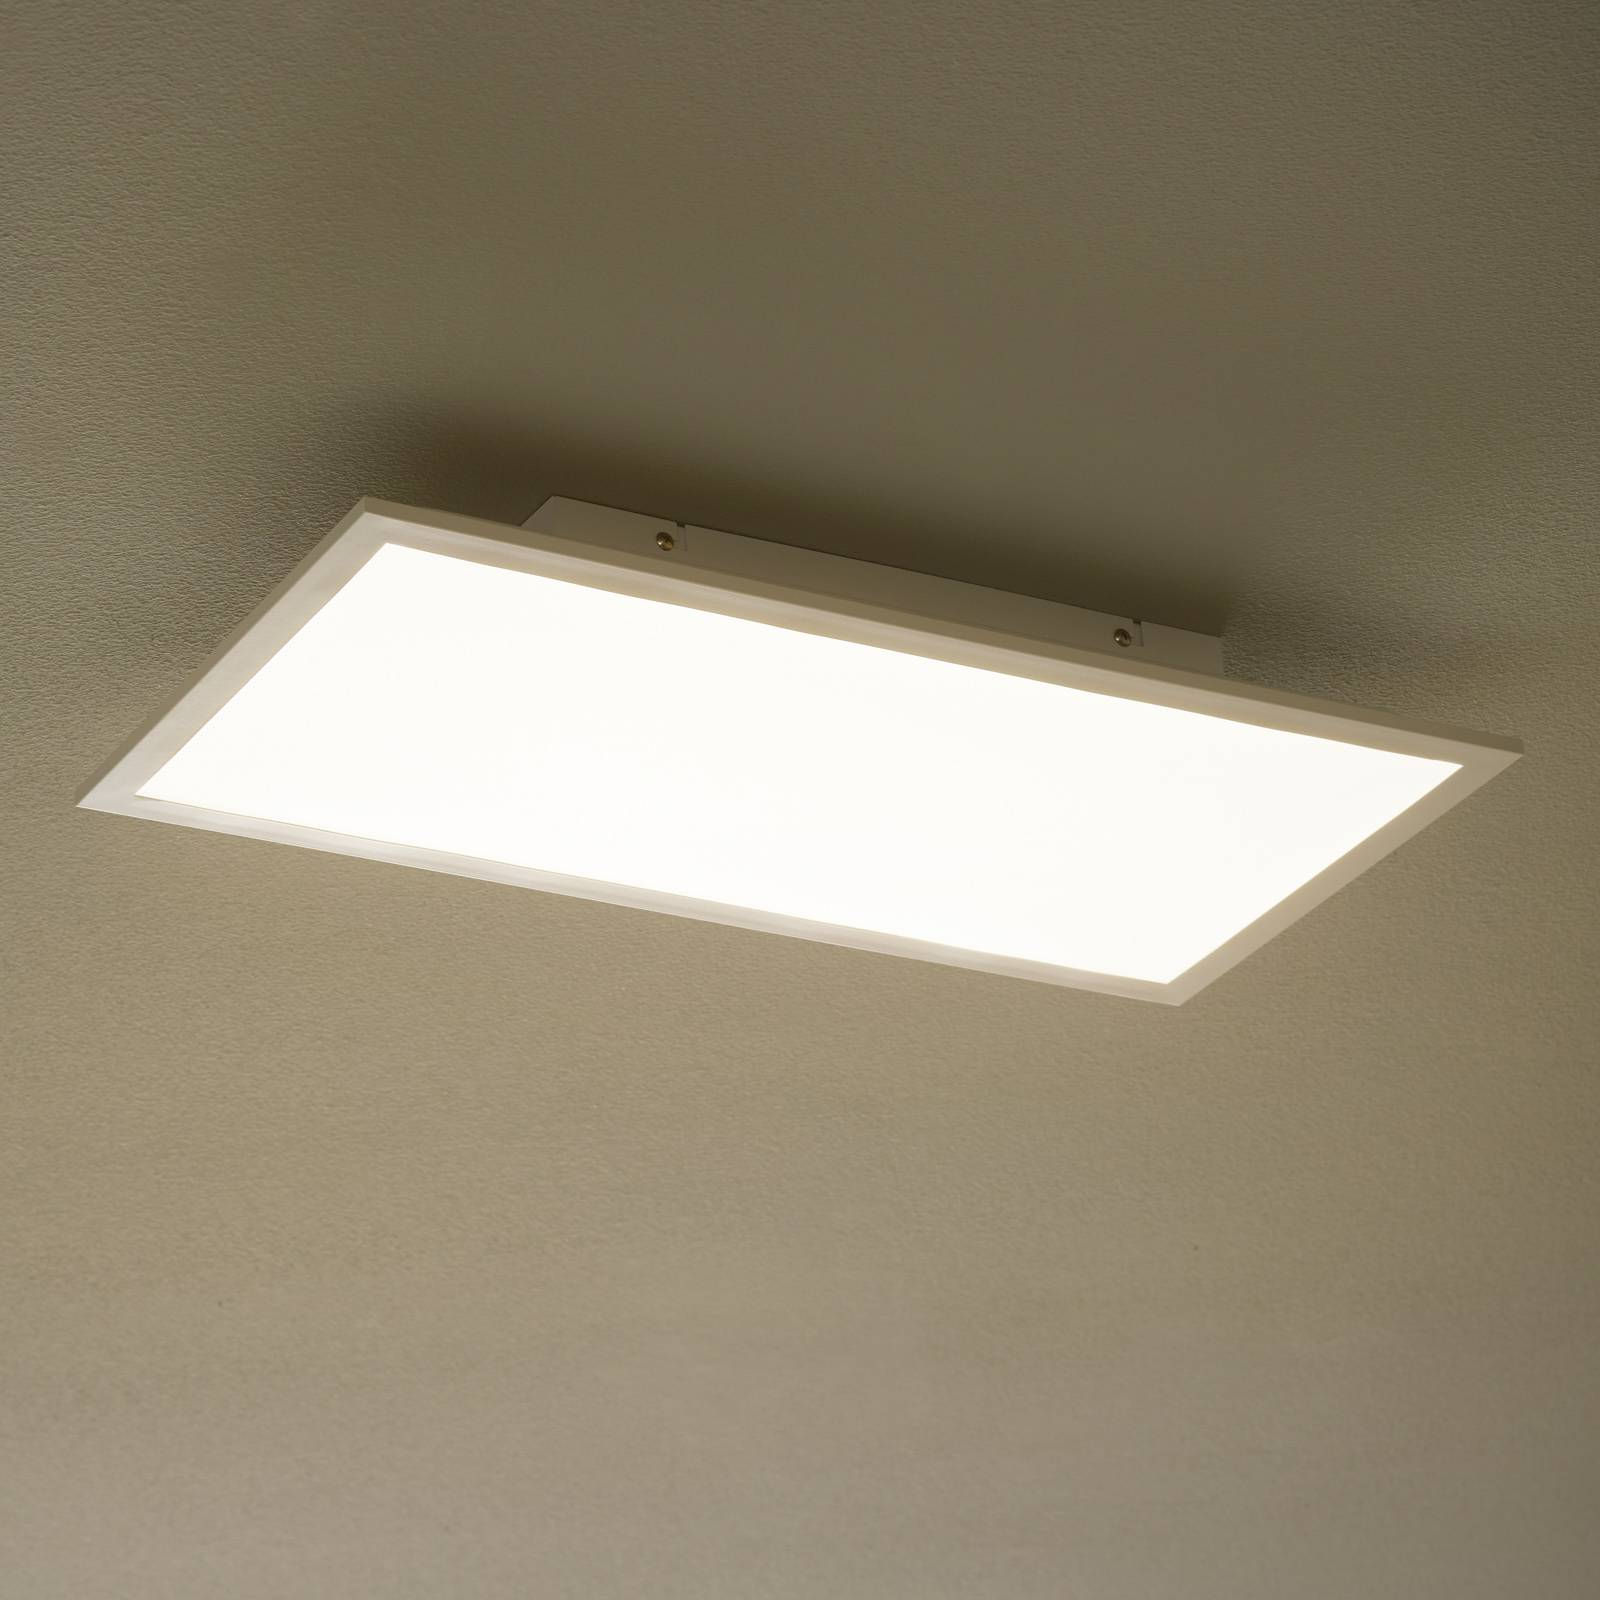 Lampa sufitowa LED Fleet czujnik ruchu 60x30 cm